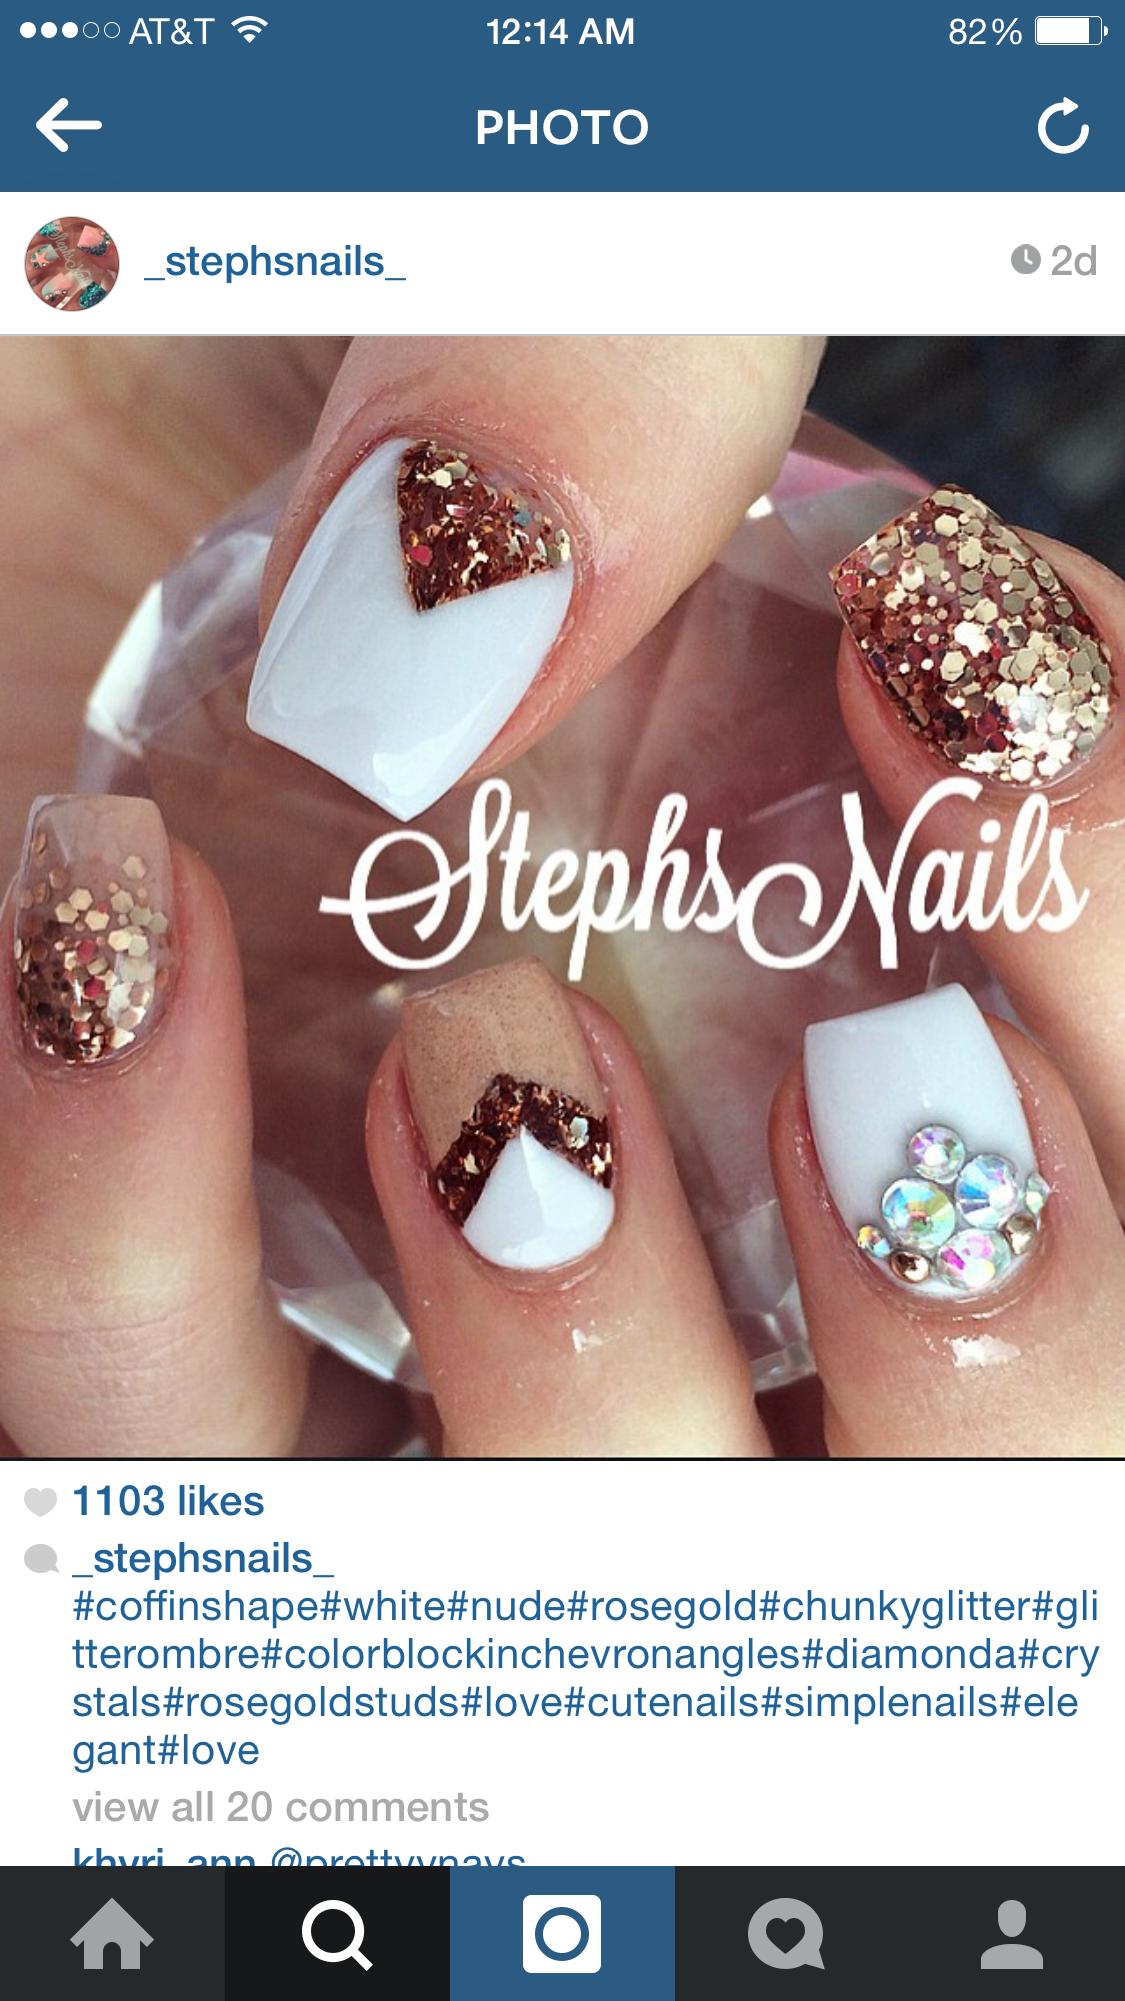 Pin de Corinne Degree en Nails | Pinterest | Diseños de uñas, Arte ...